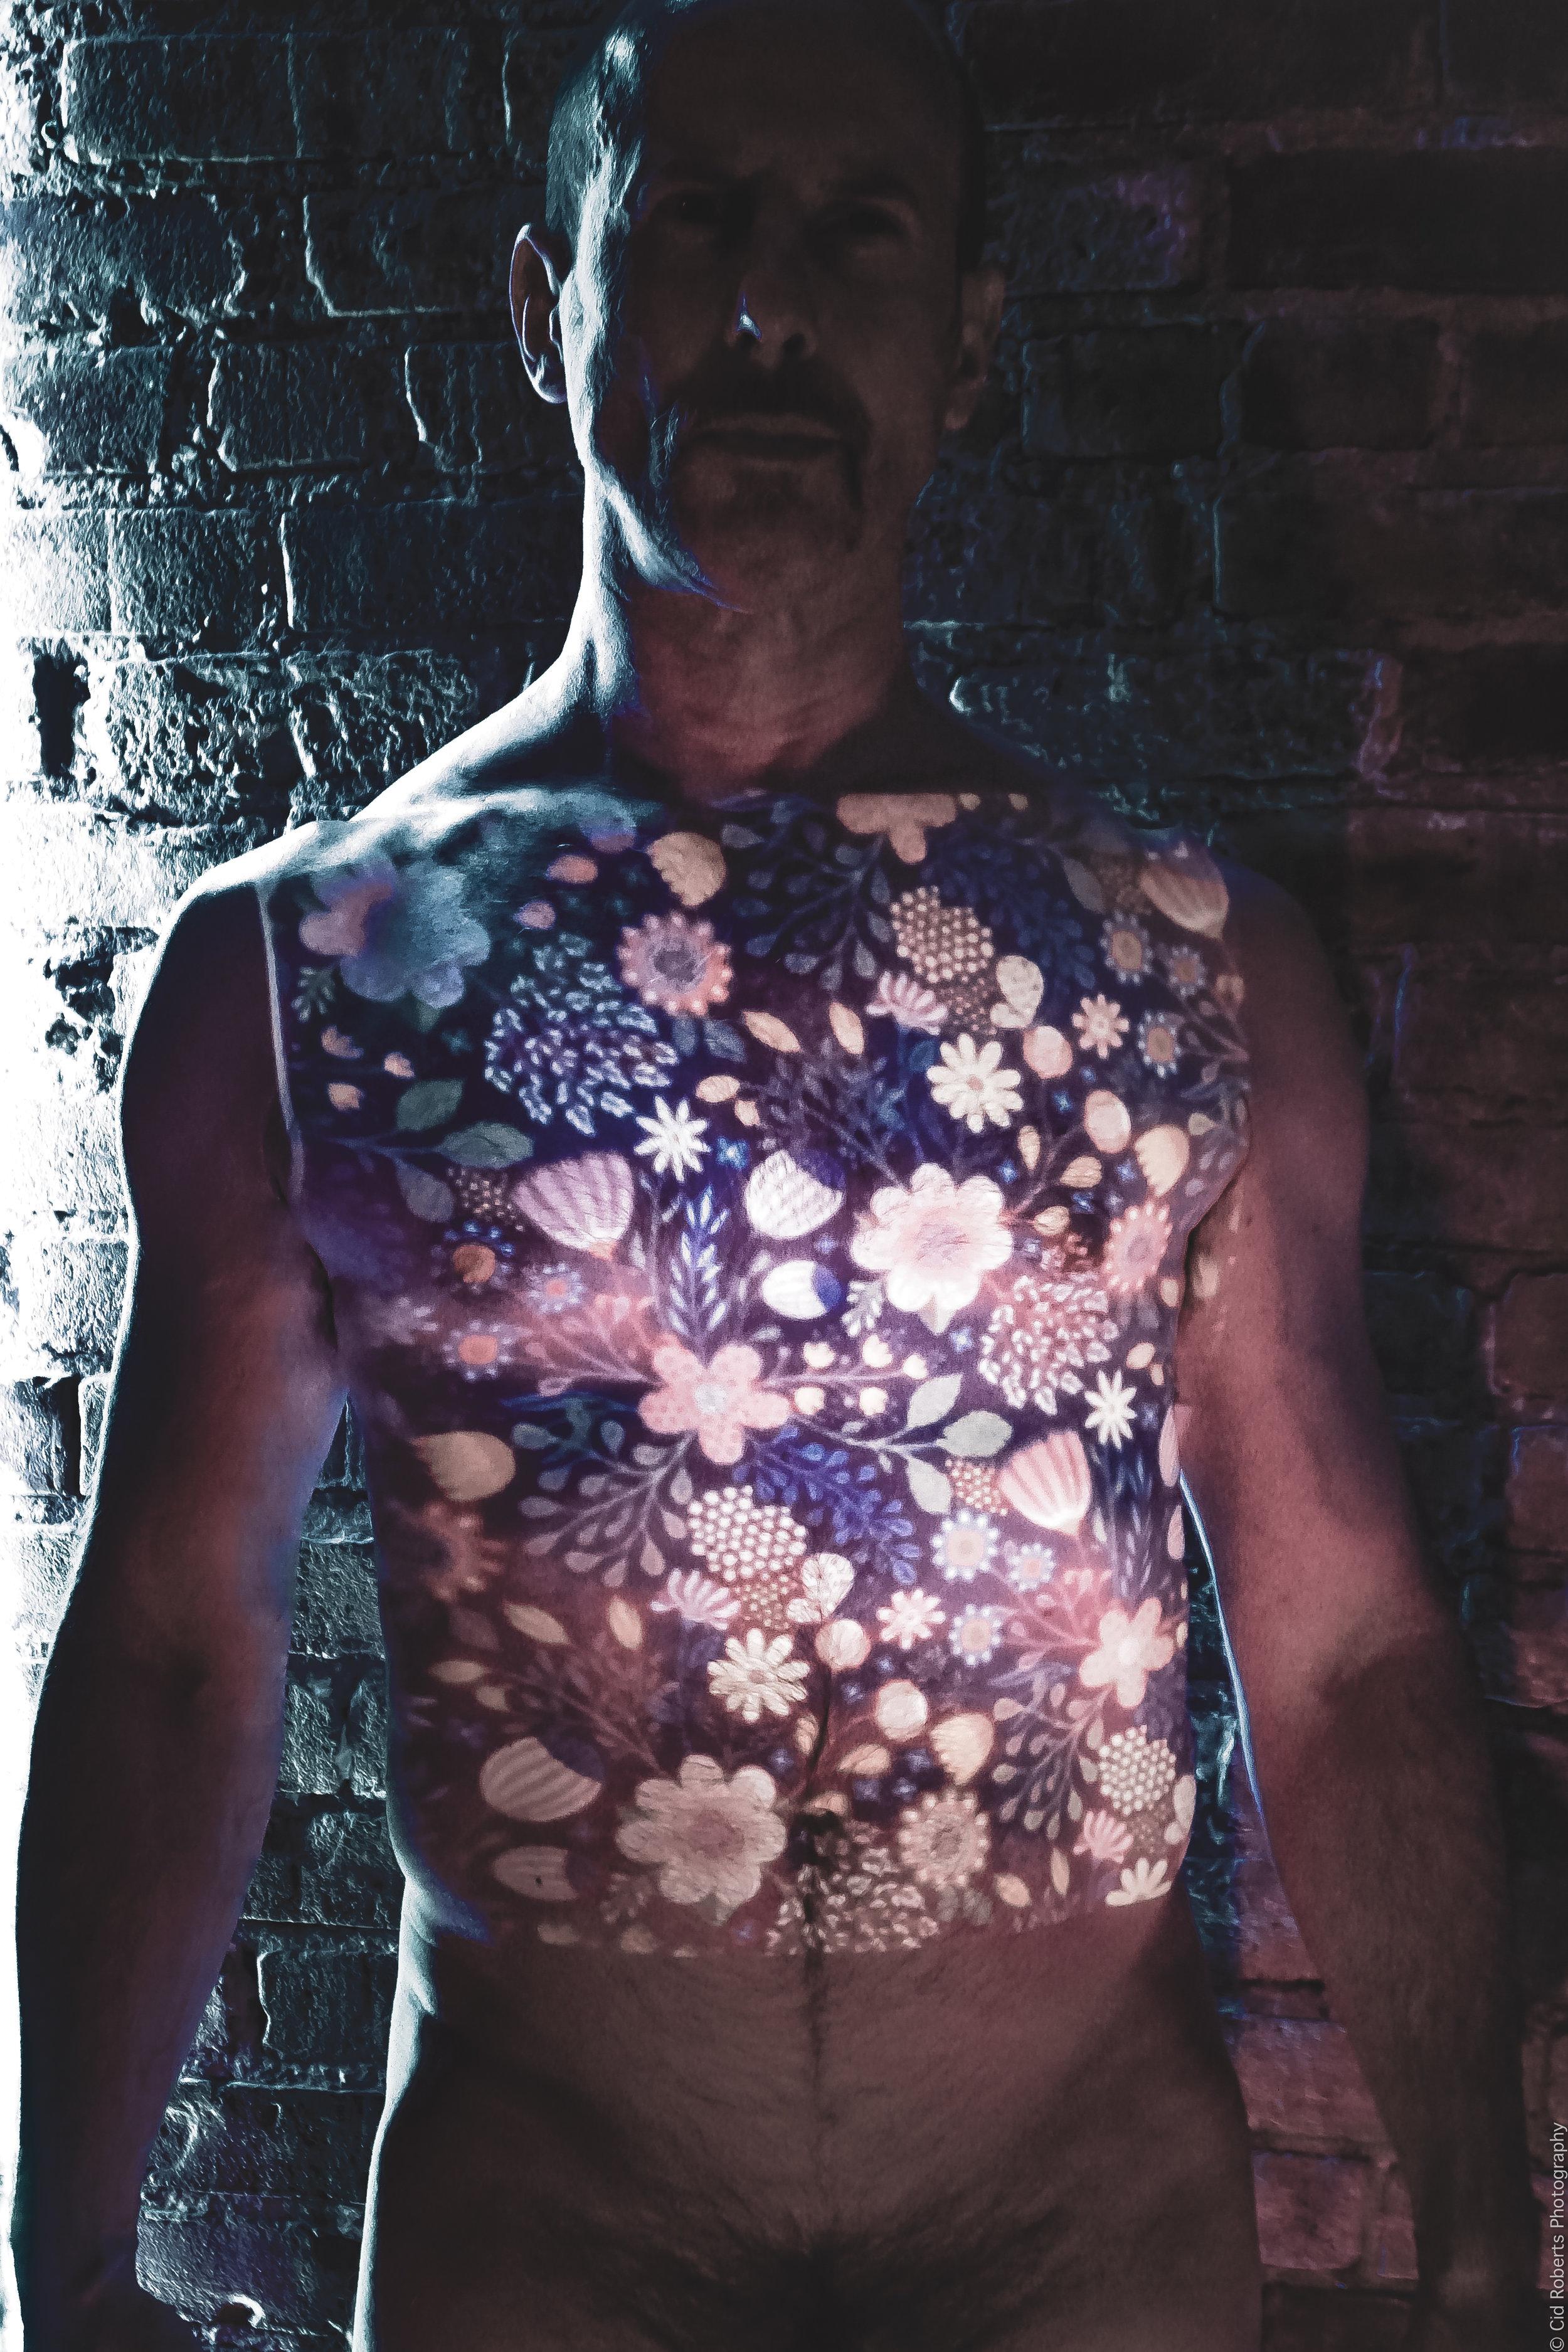 Scott Floral Projection.jpg